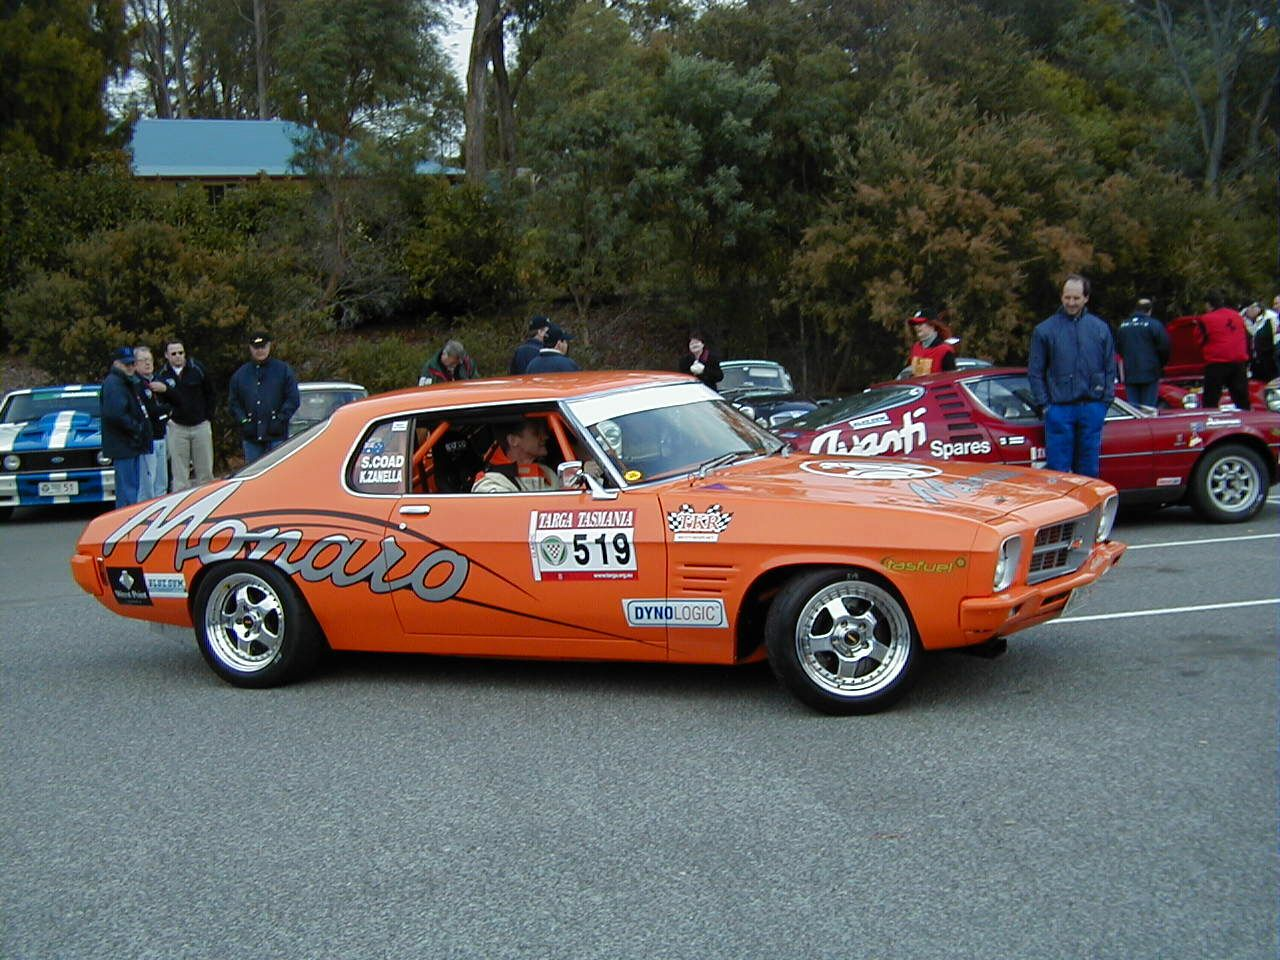 old school monaro at targa tasmania famous holden chev race cars. Black Bedroom Furniture Sets. Home Design Ideas